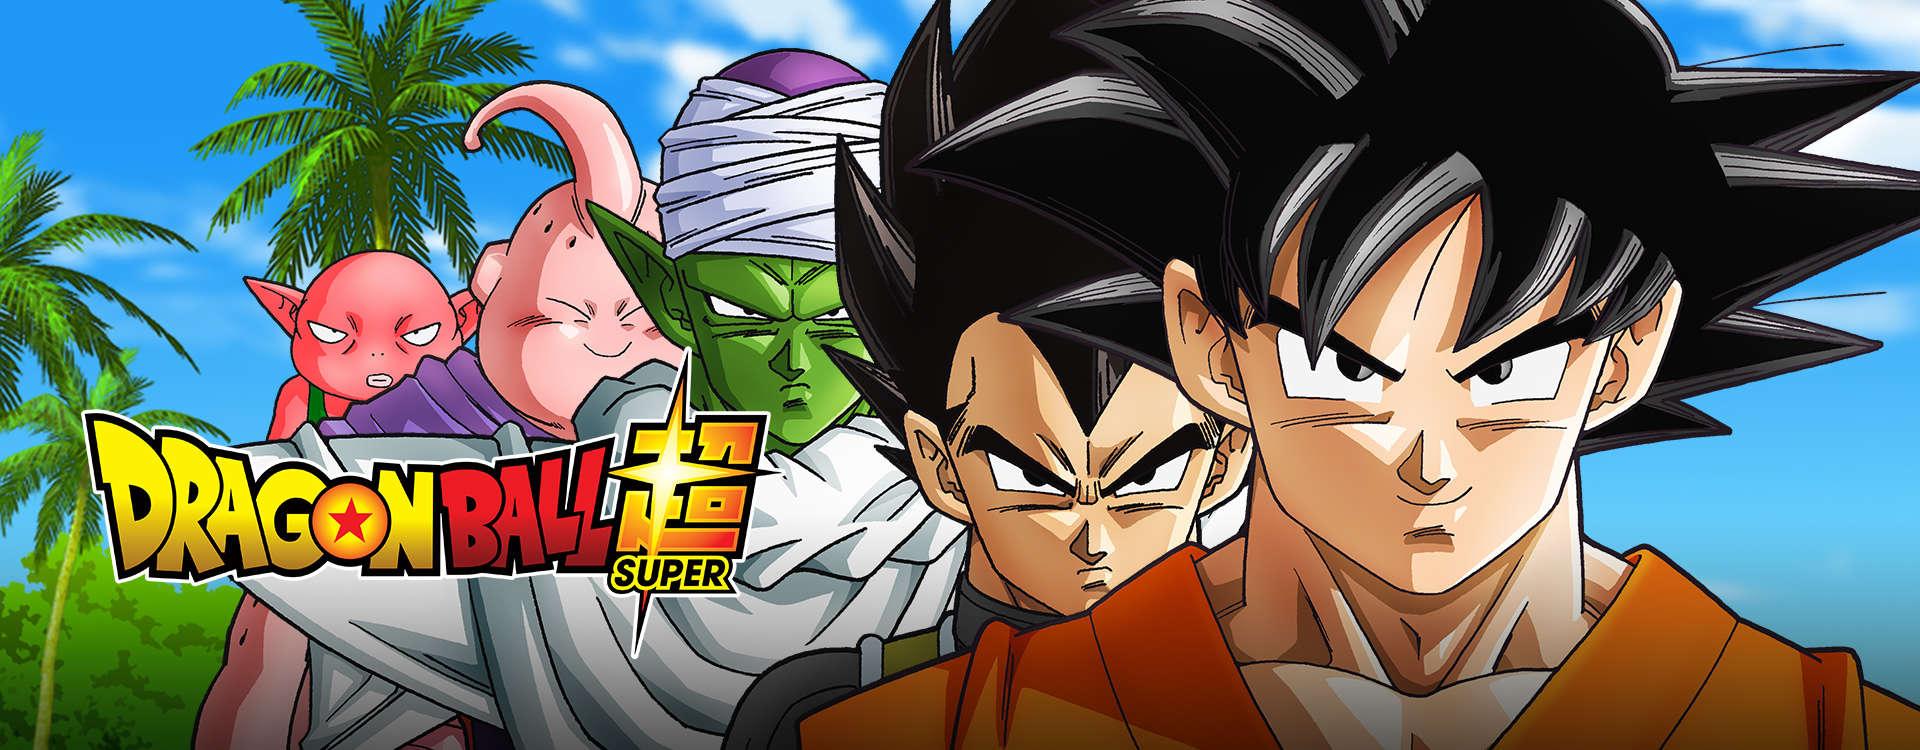 Dragon Ball Super Prosieben Maxx